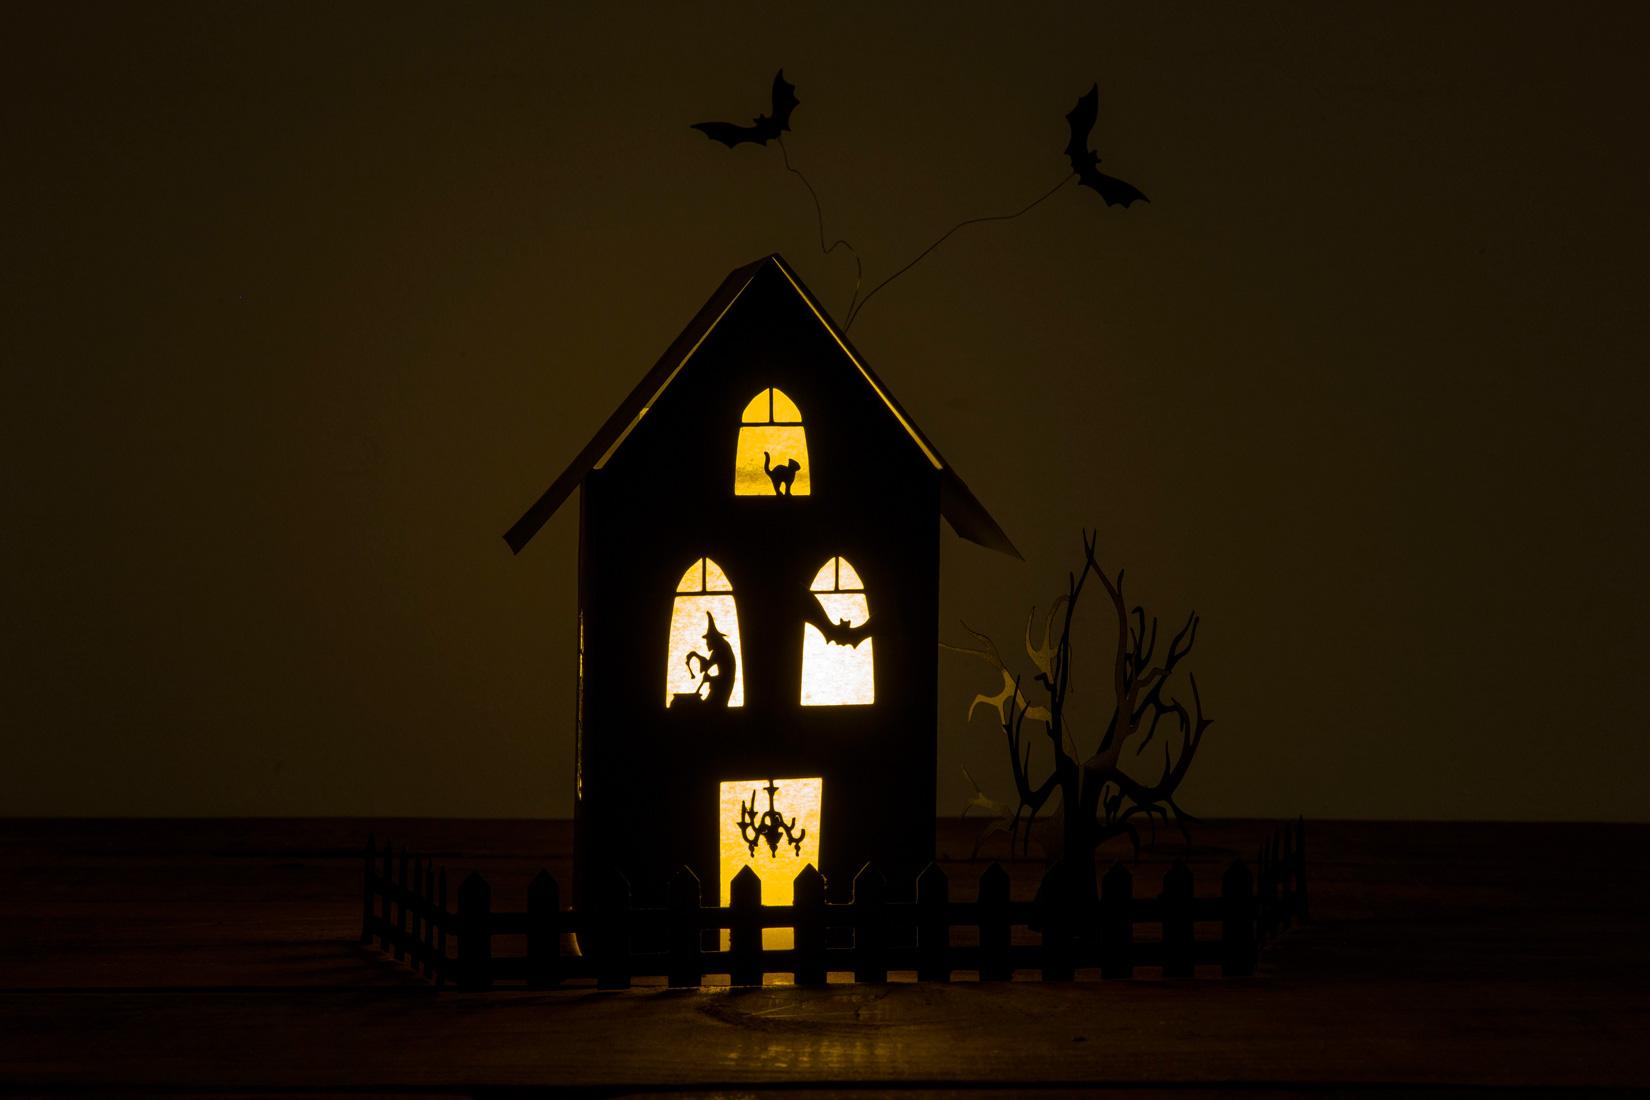 Casa Assombrada 5